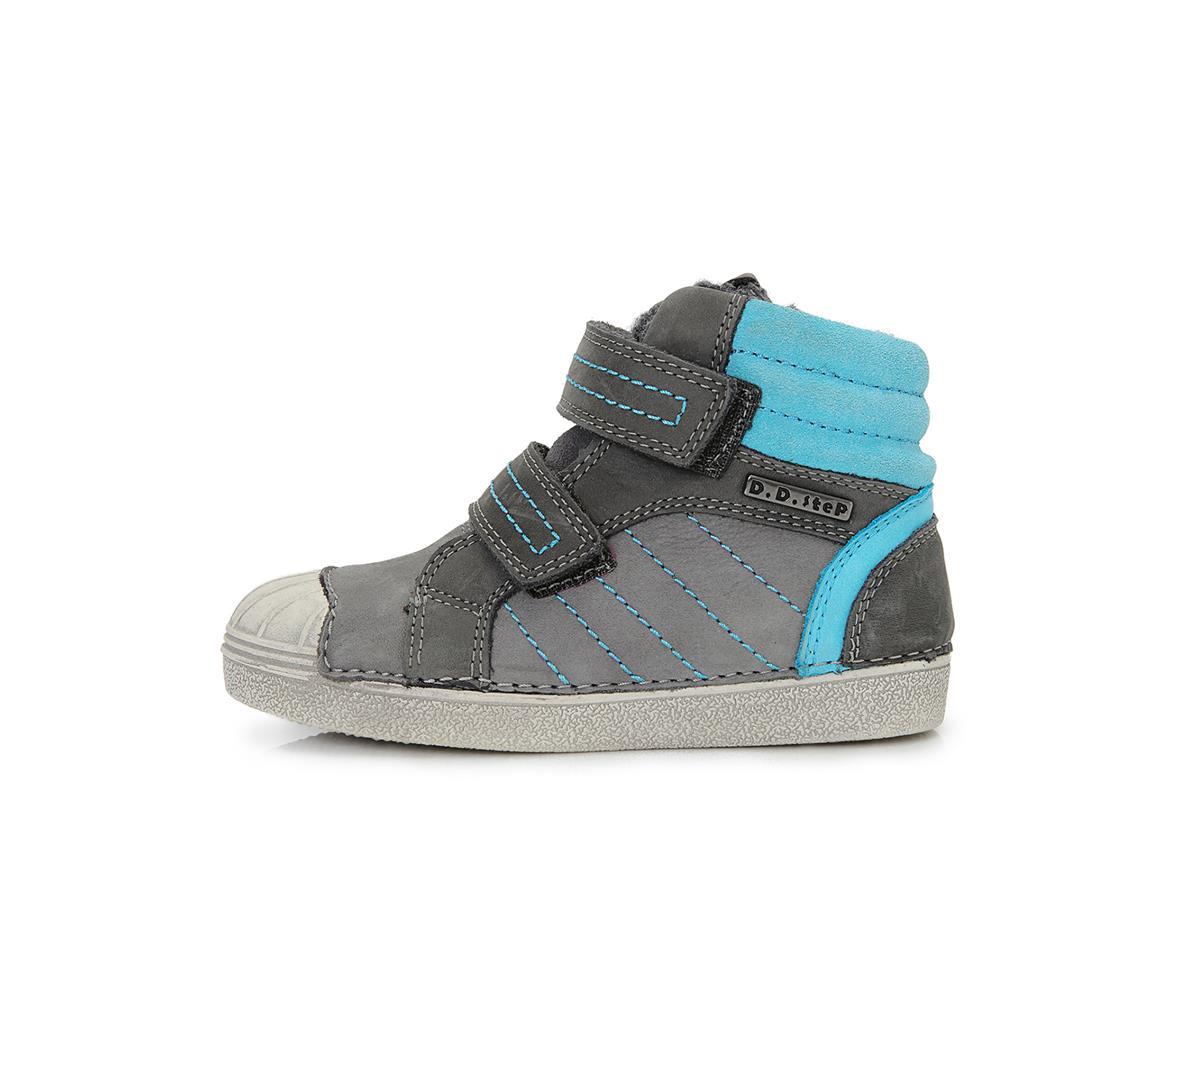 Zimní obuv D.D.Step 043-504AM - vel.25 6db2baeed3